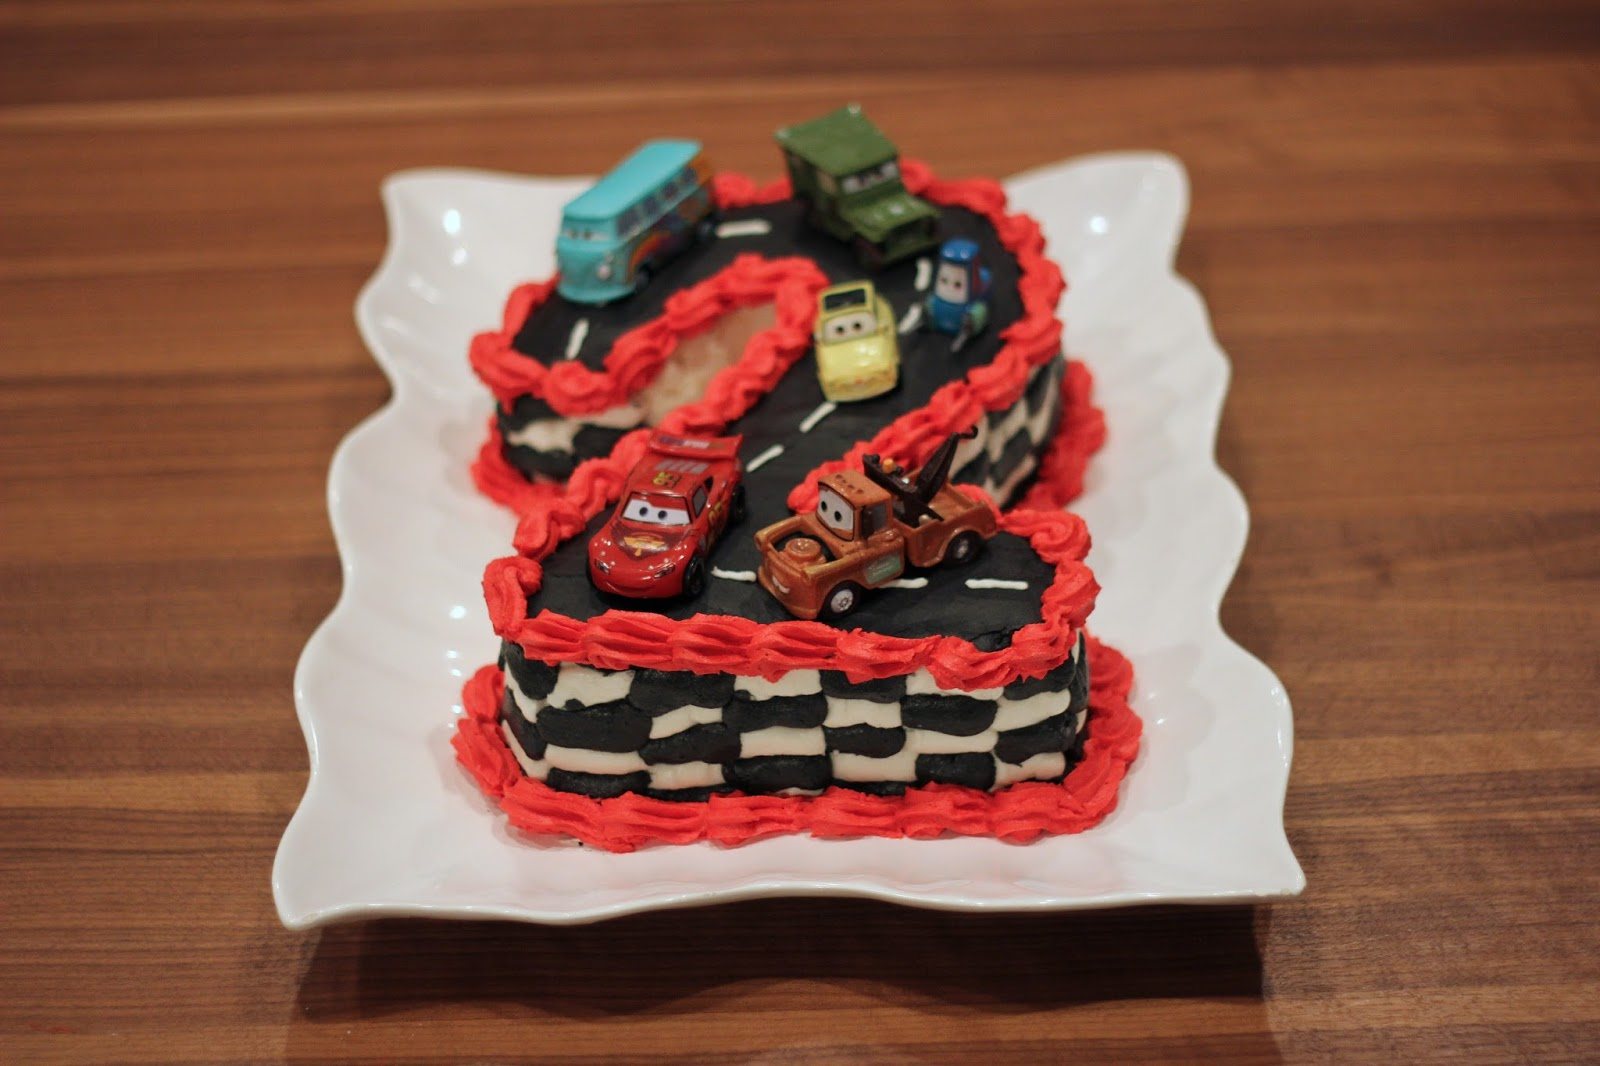 Disney Cars Birthday Cake: Disney's Cars Themed Cake